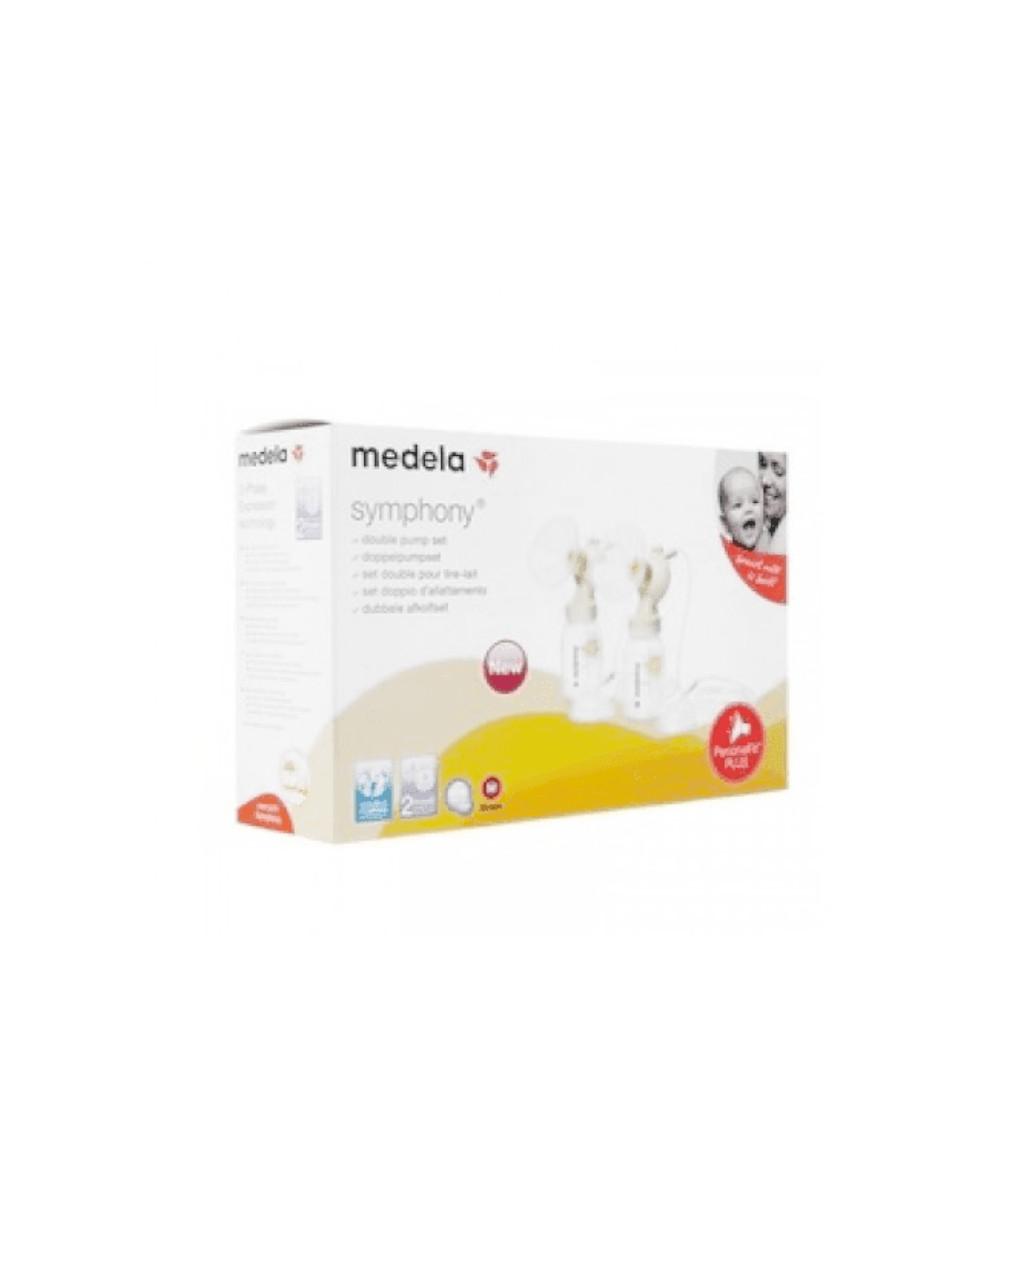 Set symphony doppio con personalfit plus (24 mm) - Medela